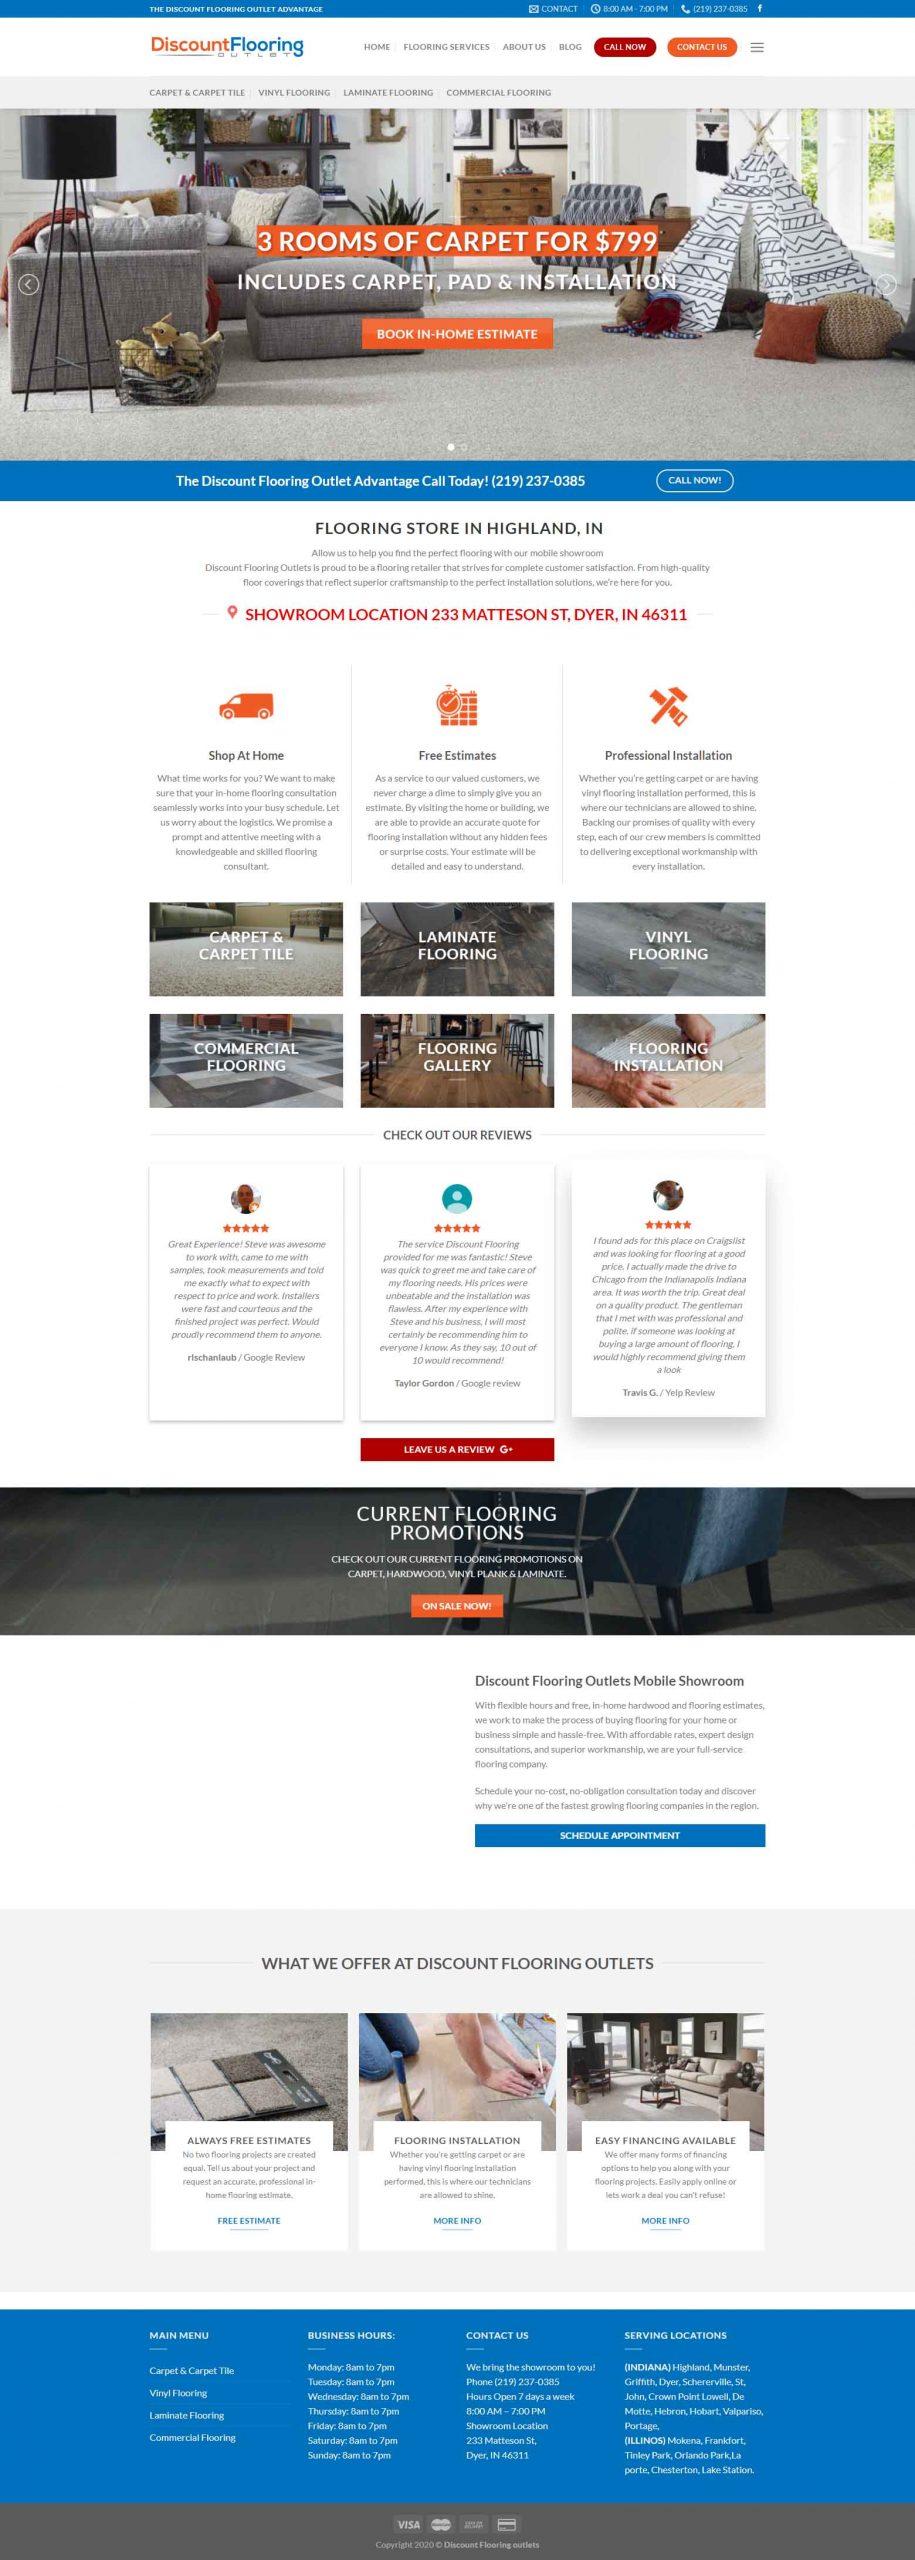 Retail Flooring Website Design Marketing Company